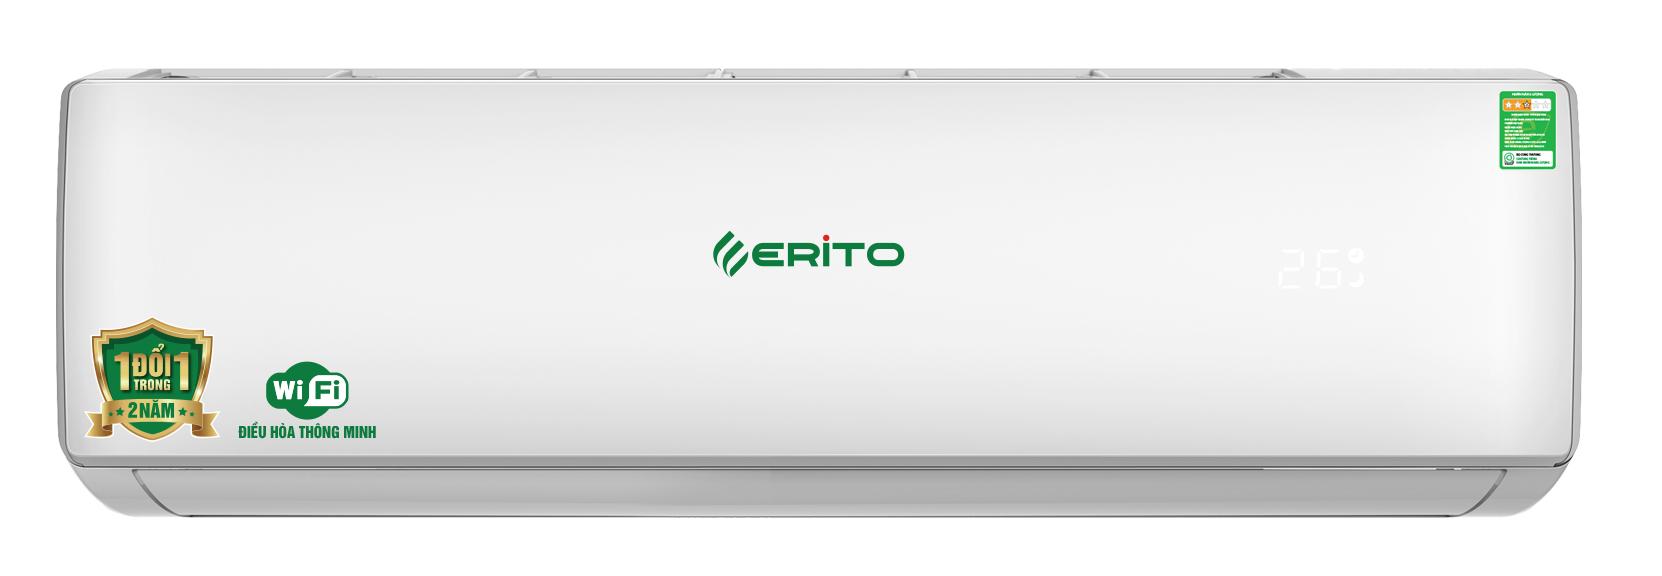 Điều hòa Erito 12000 BTU một chiều